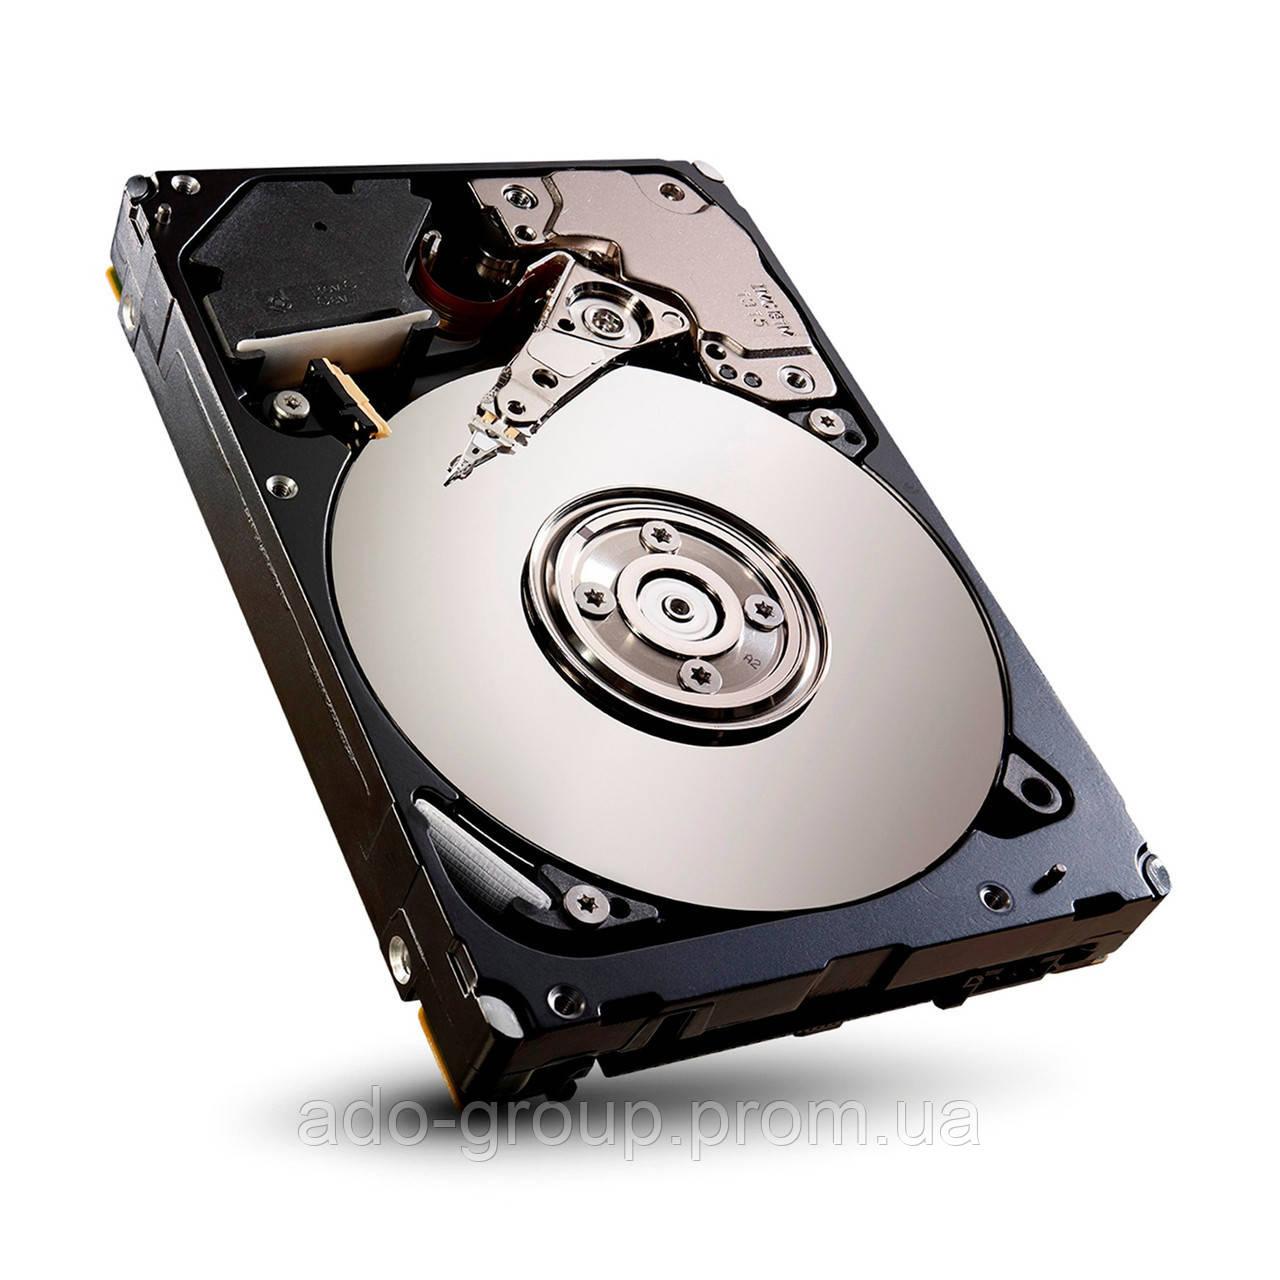 "342-5742 Жесткий диск Dell 500GB SAS 7.2K  2.5"" +"